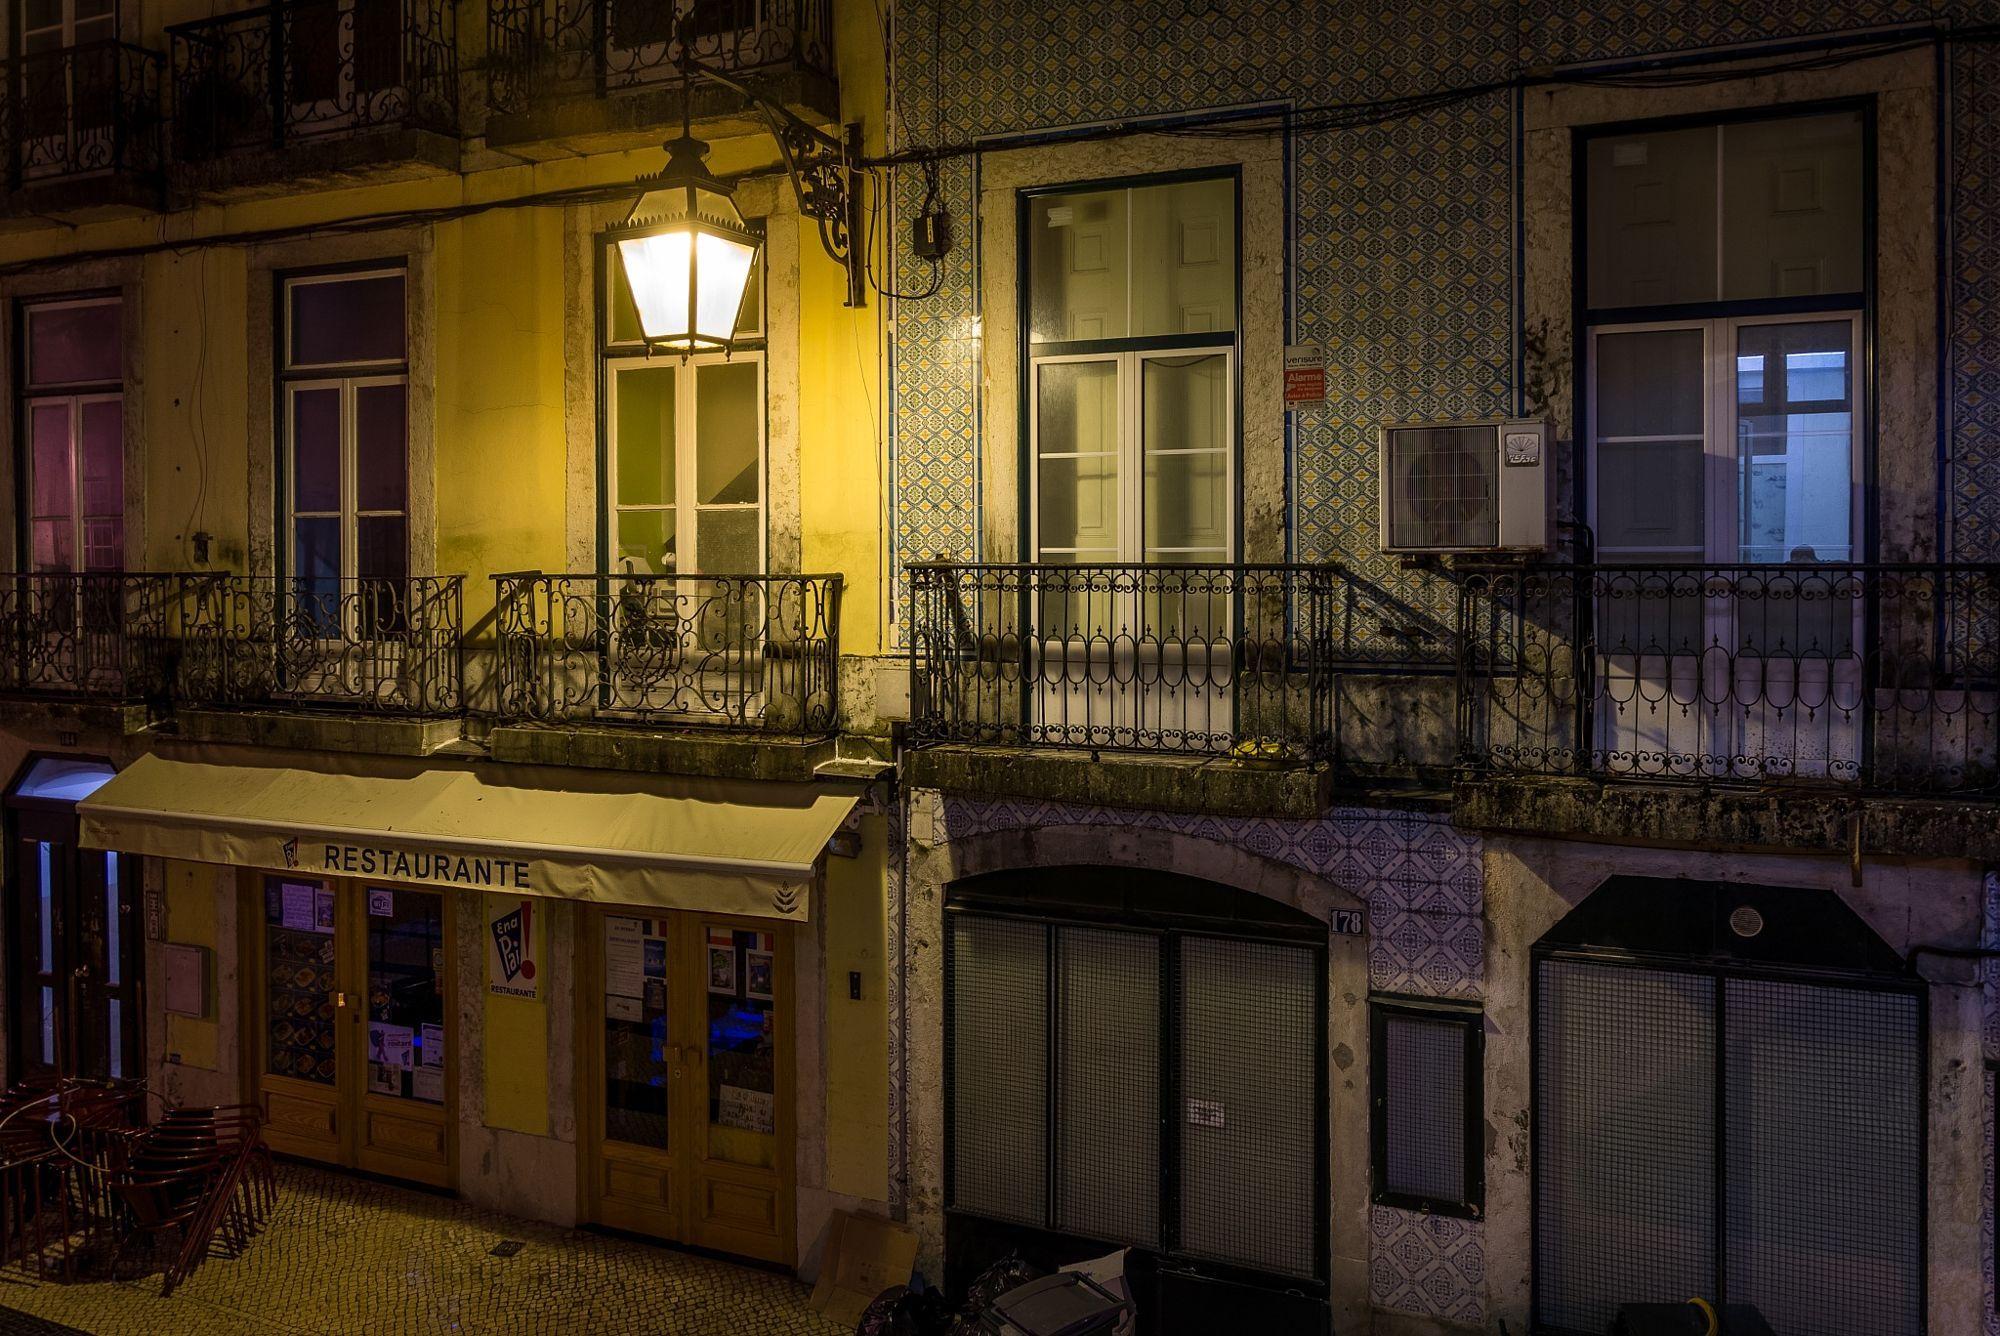 First Impression  Travel photo by Aperturix http://rarme.com/?F9gZi